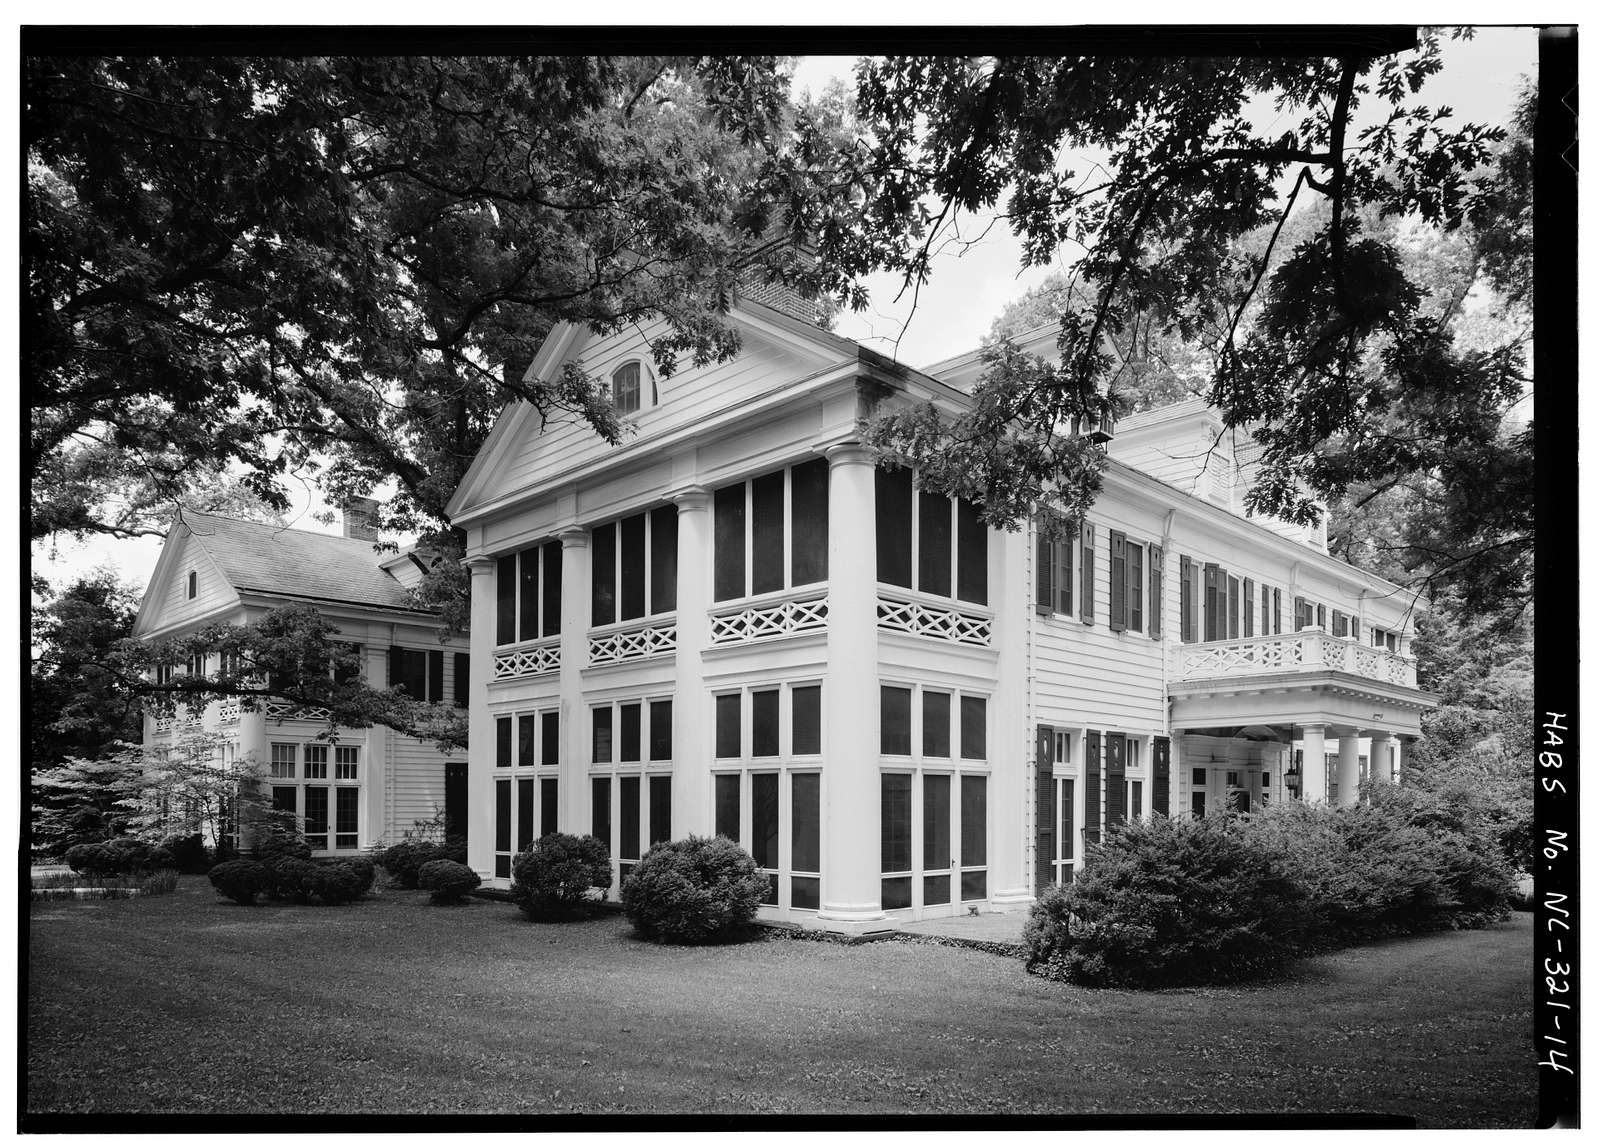 James Buchanan Duke House, 400 Hermitage, Charlotte, Mecklenburg County, NC